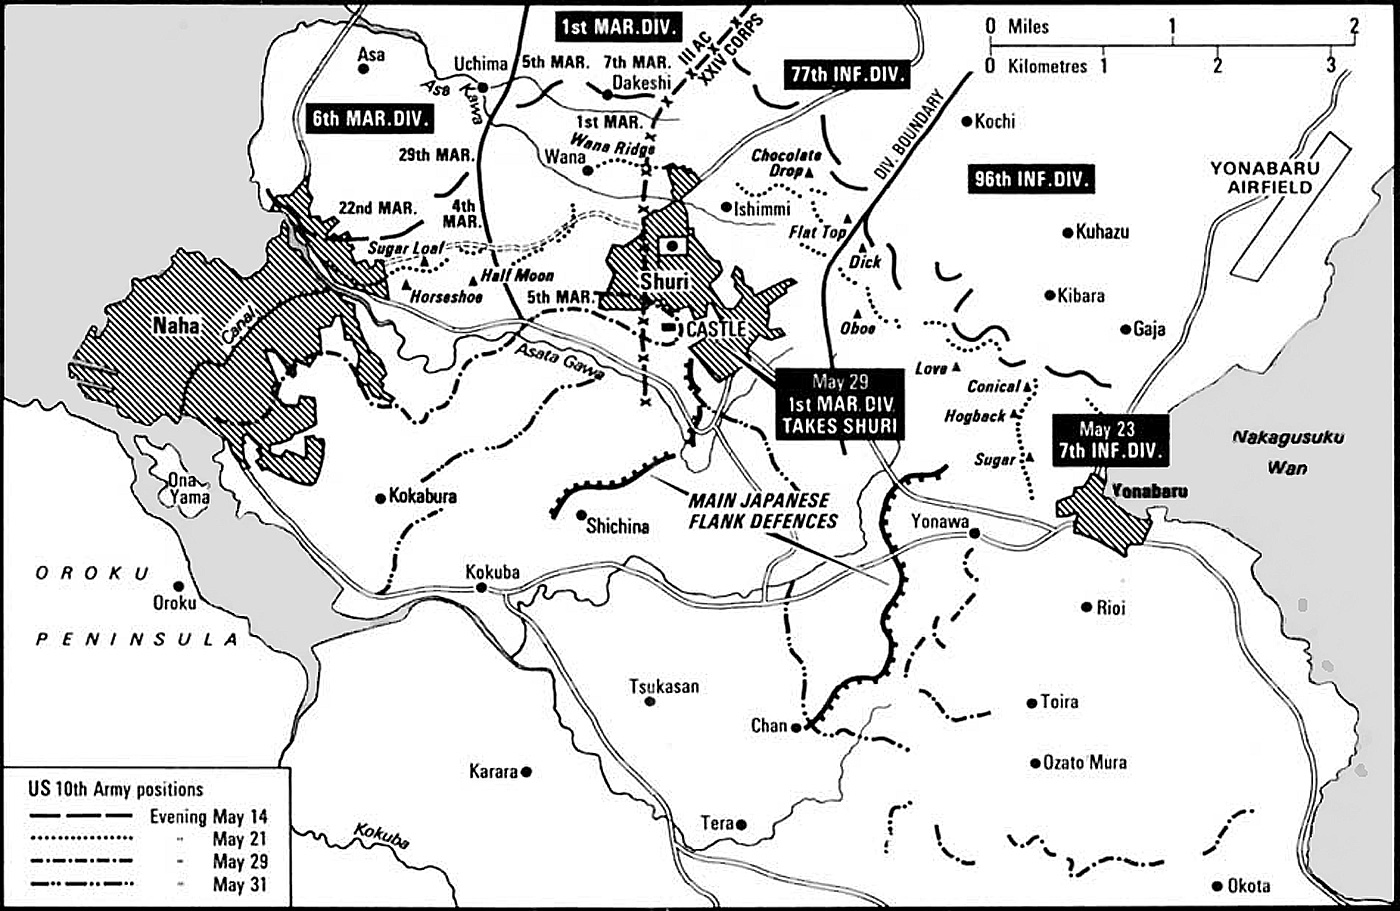 http://ibiblio.org/hyperwar/USMC/USMC-C-Okinawa/maps/USMC-C-Okinawa-8.jpg